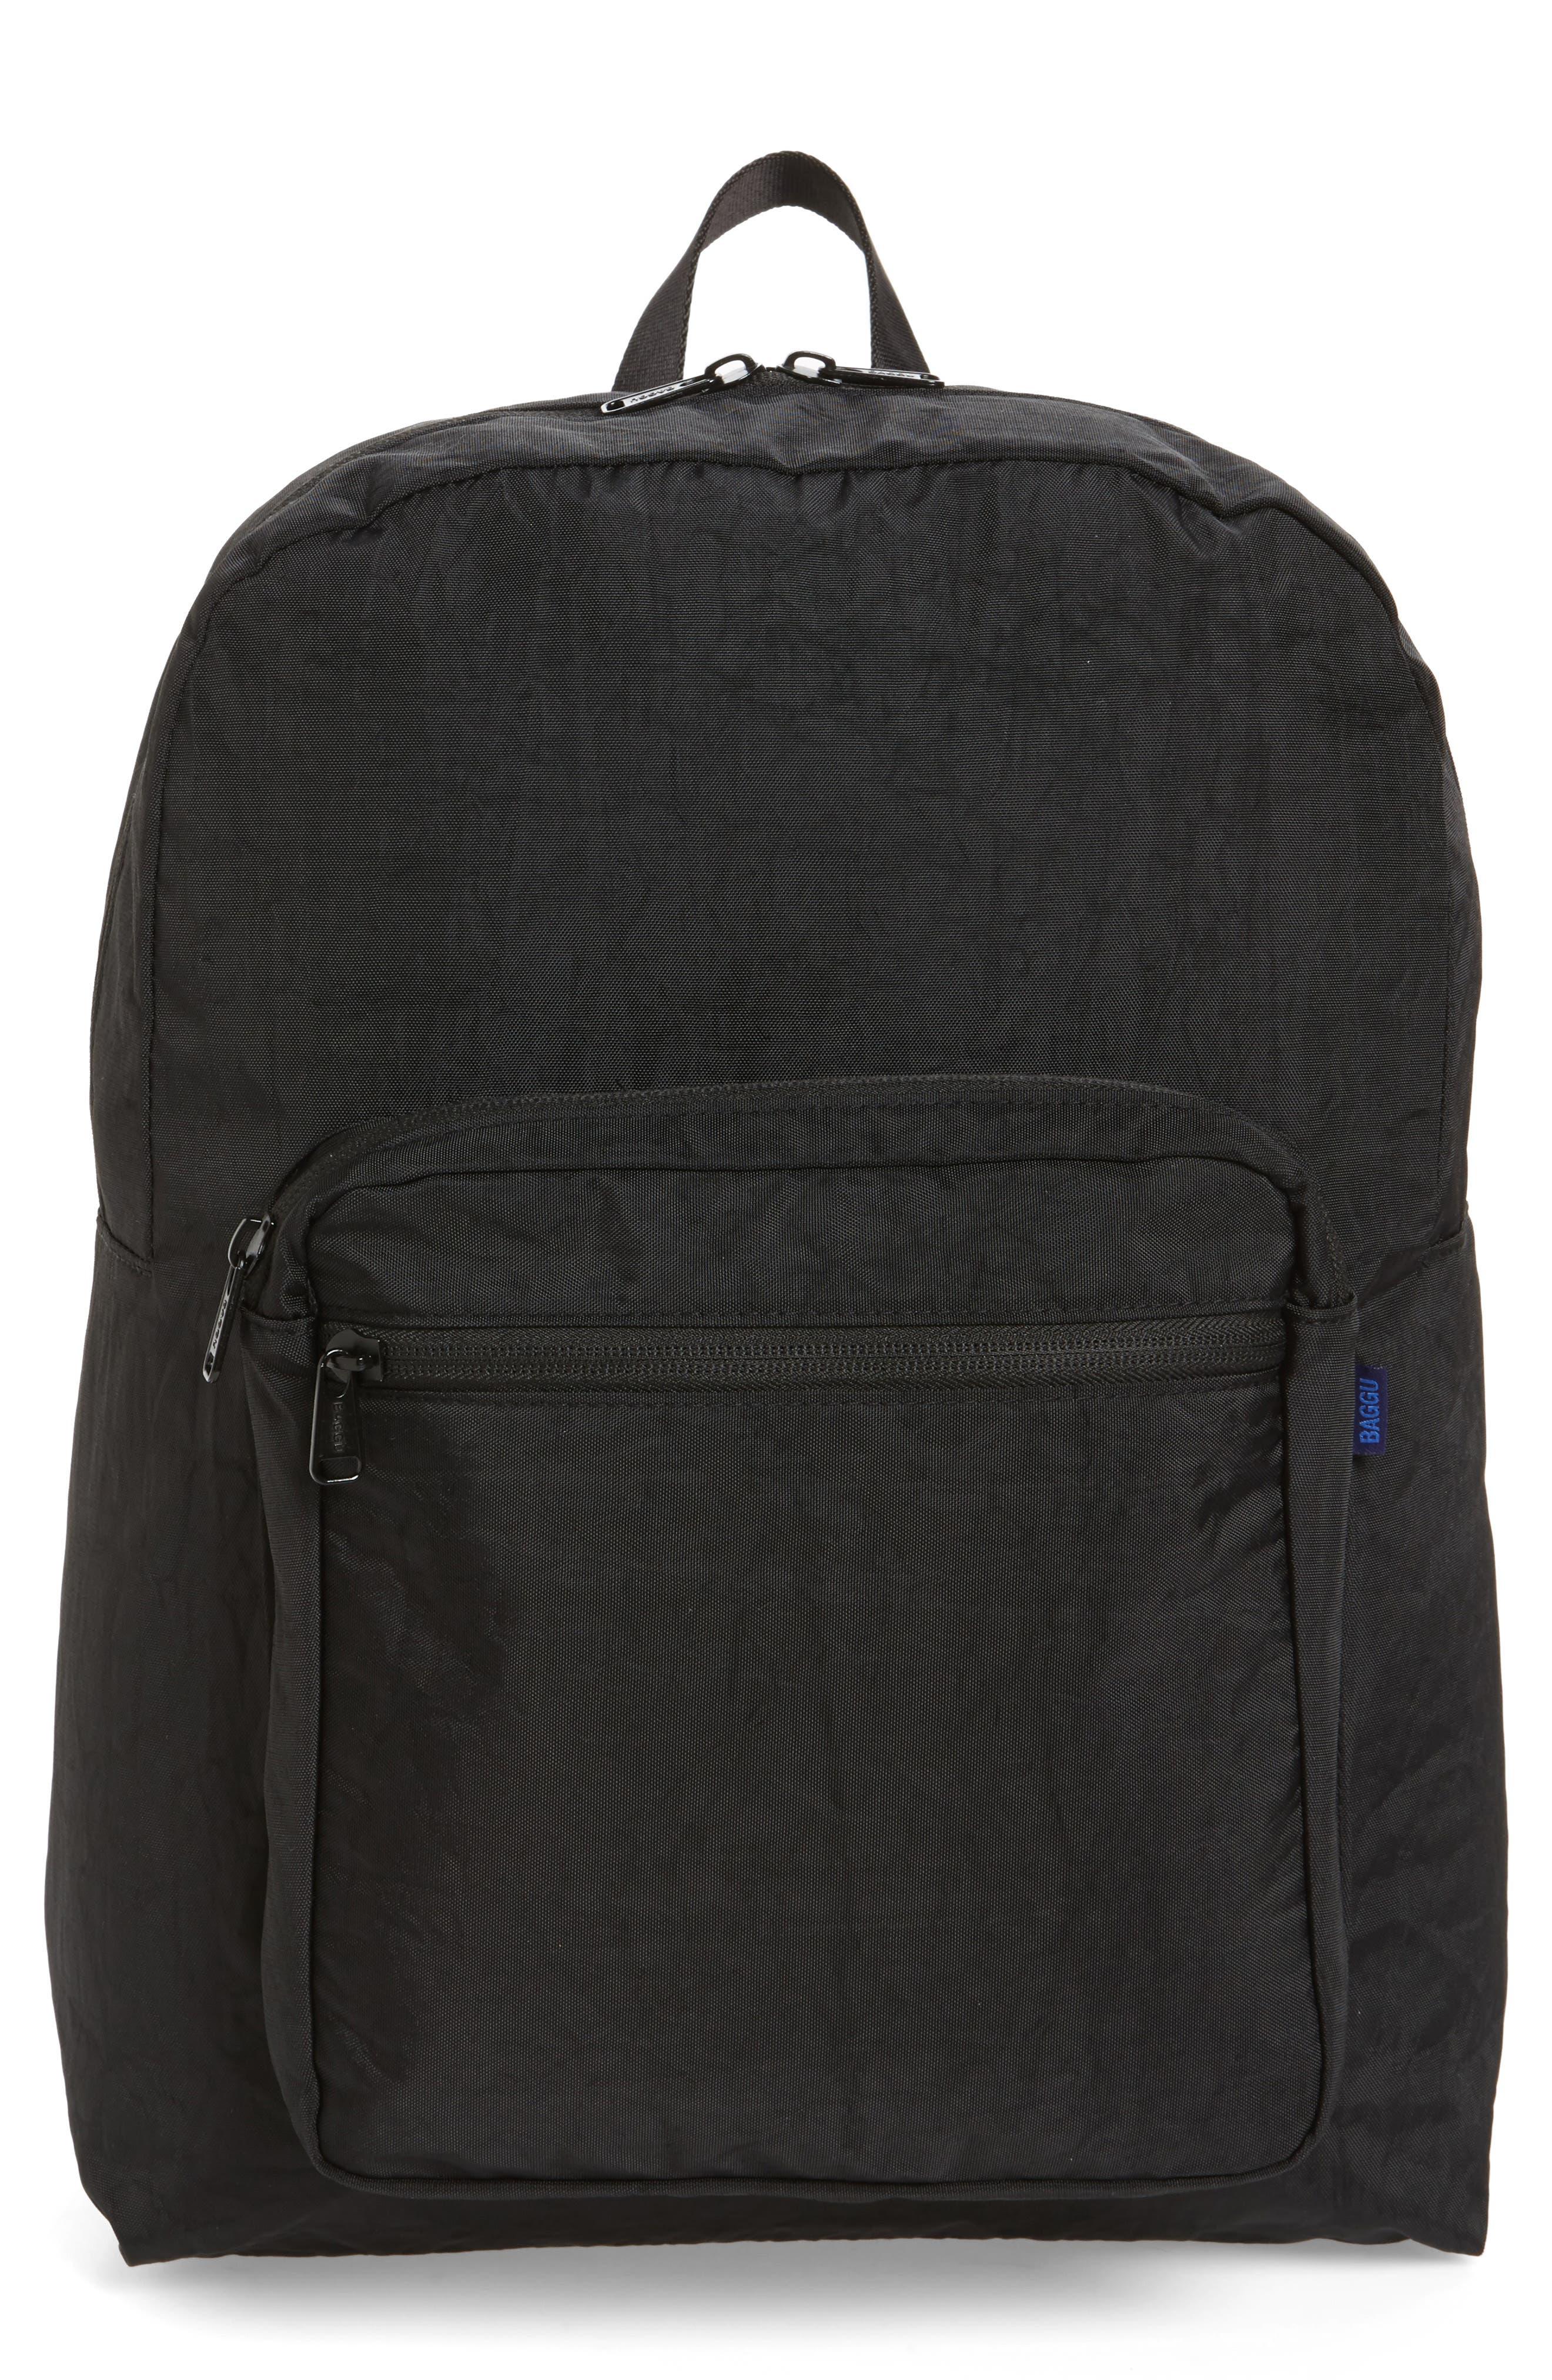 Nylon Backpack,                             Main thumbnail 1, color,                             001